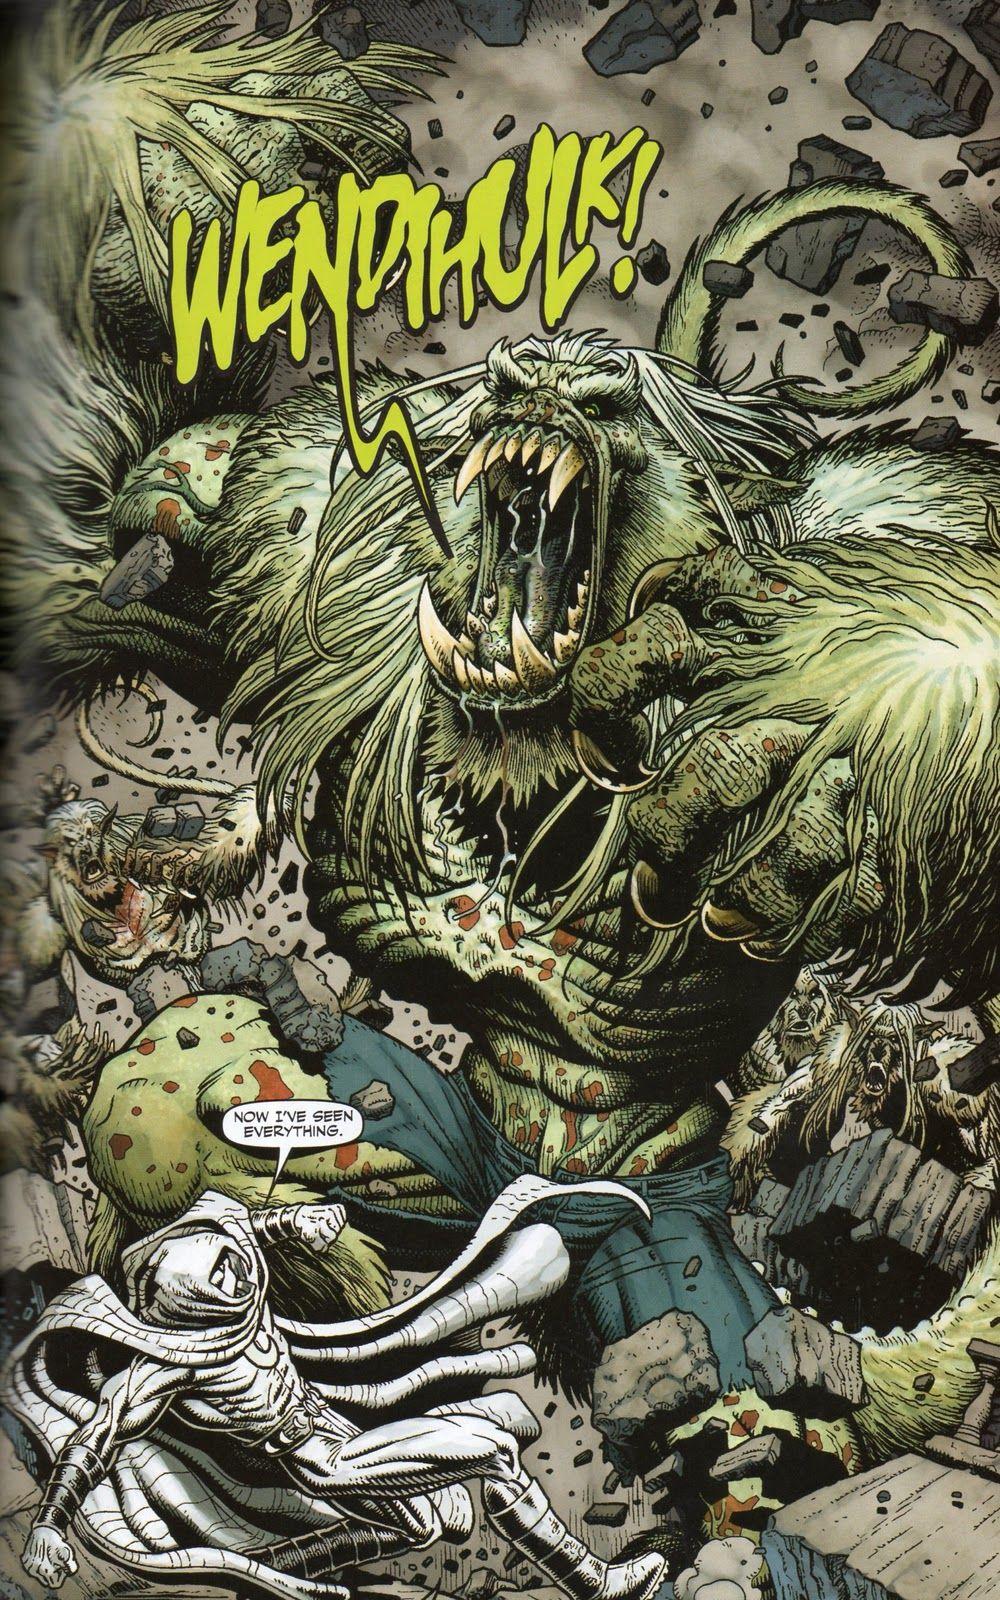 Image detail for -Arthur Adams: Hulk: Red & Green TPB